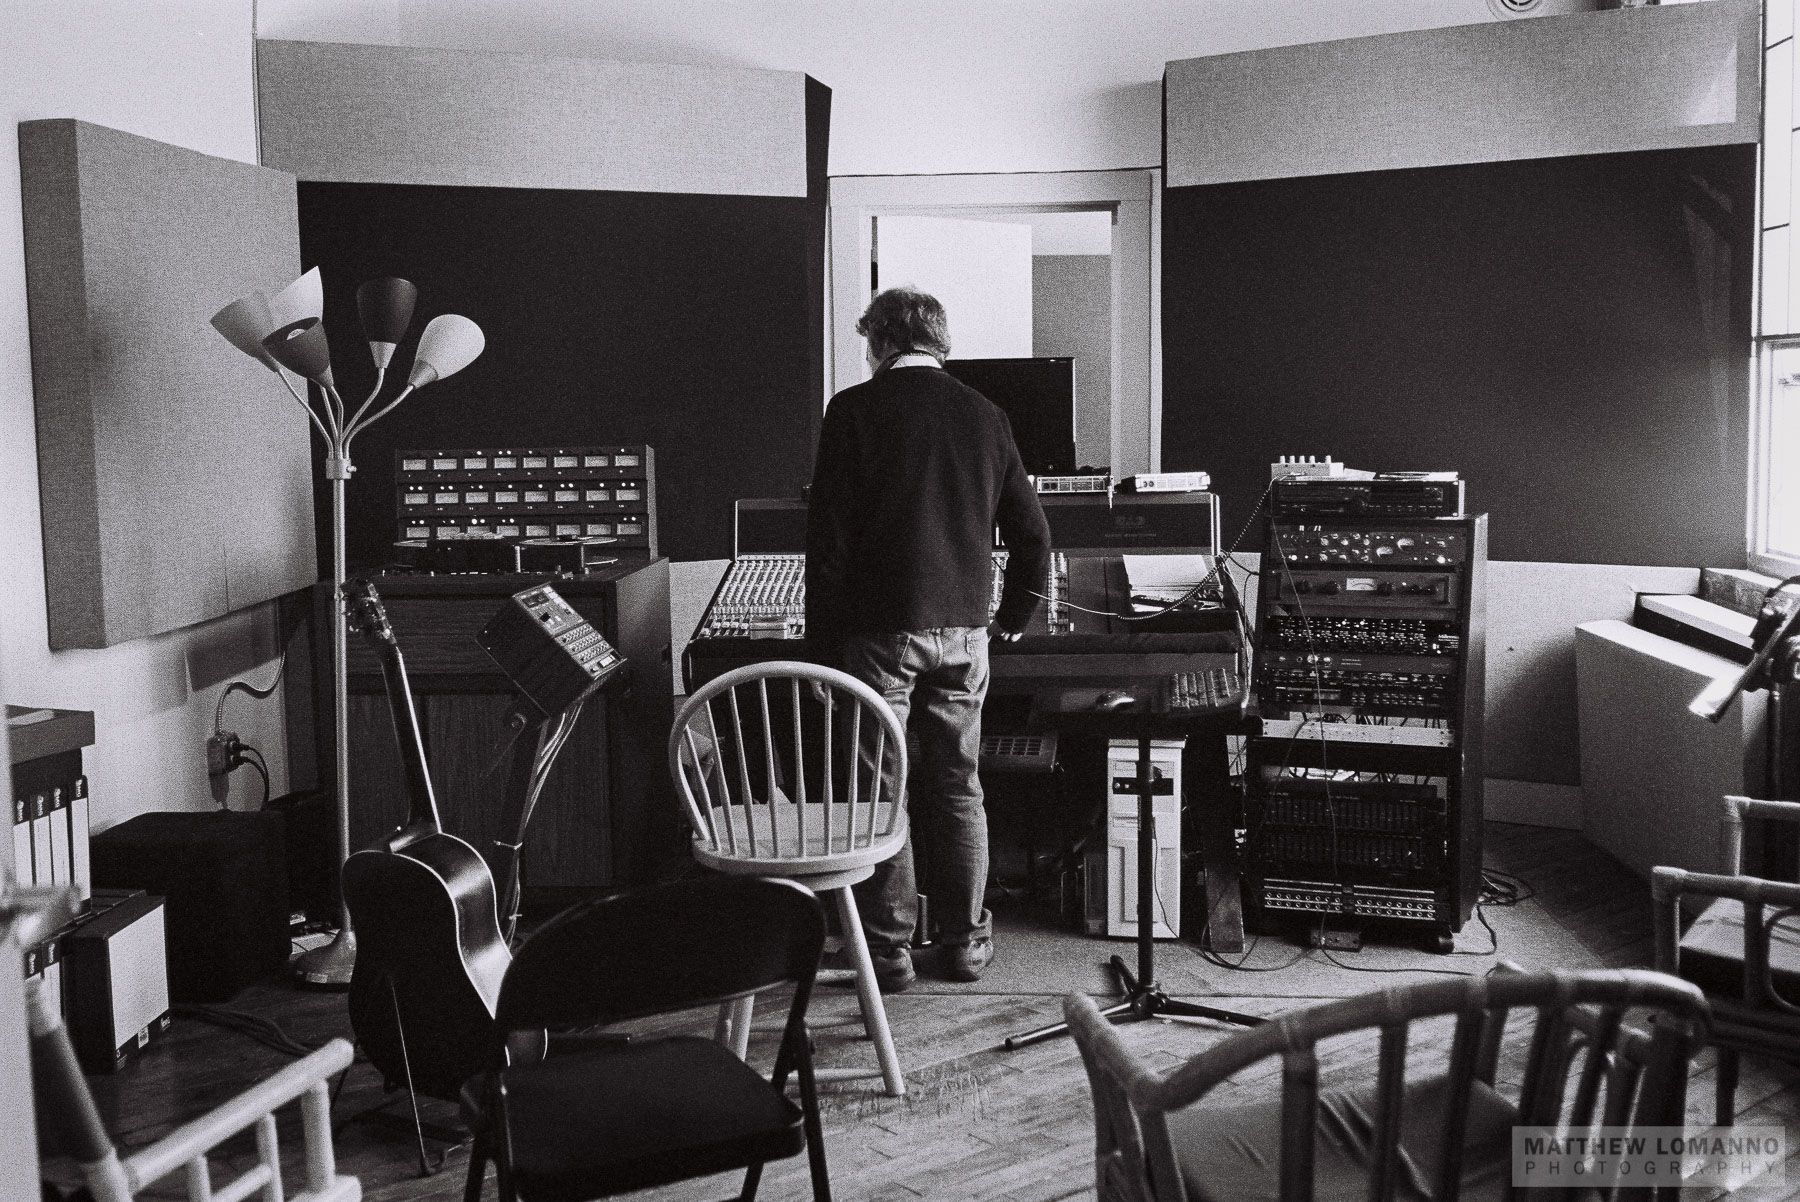 MillPondMusicStudio_Portsmouth_2013_by_Lomanno_0004_web.jpg